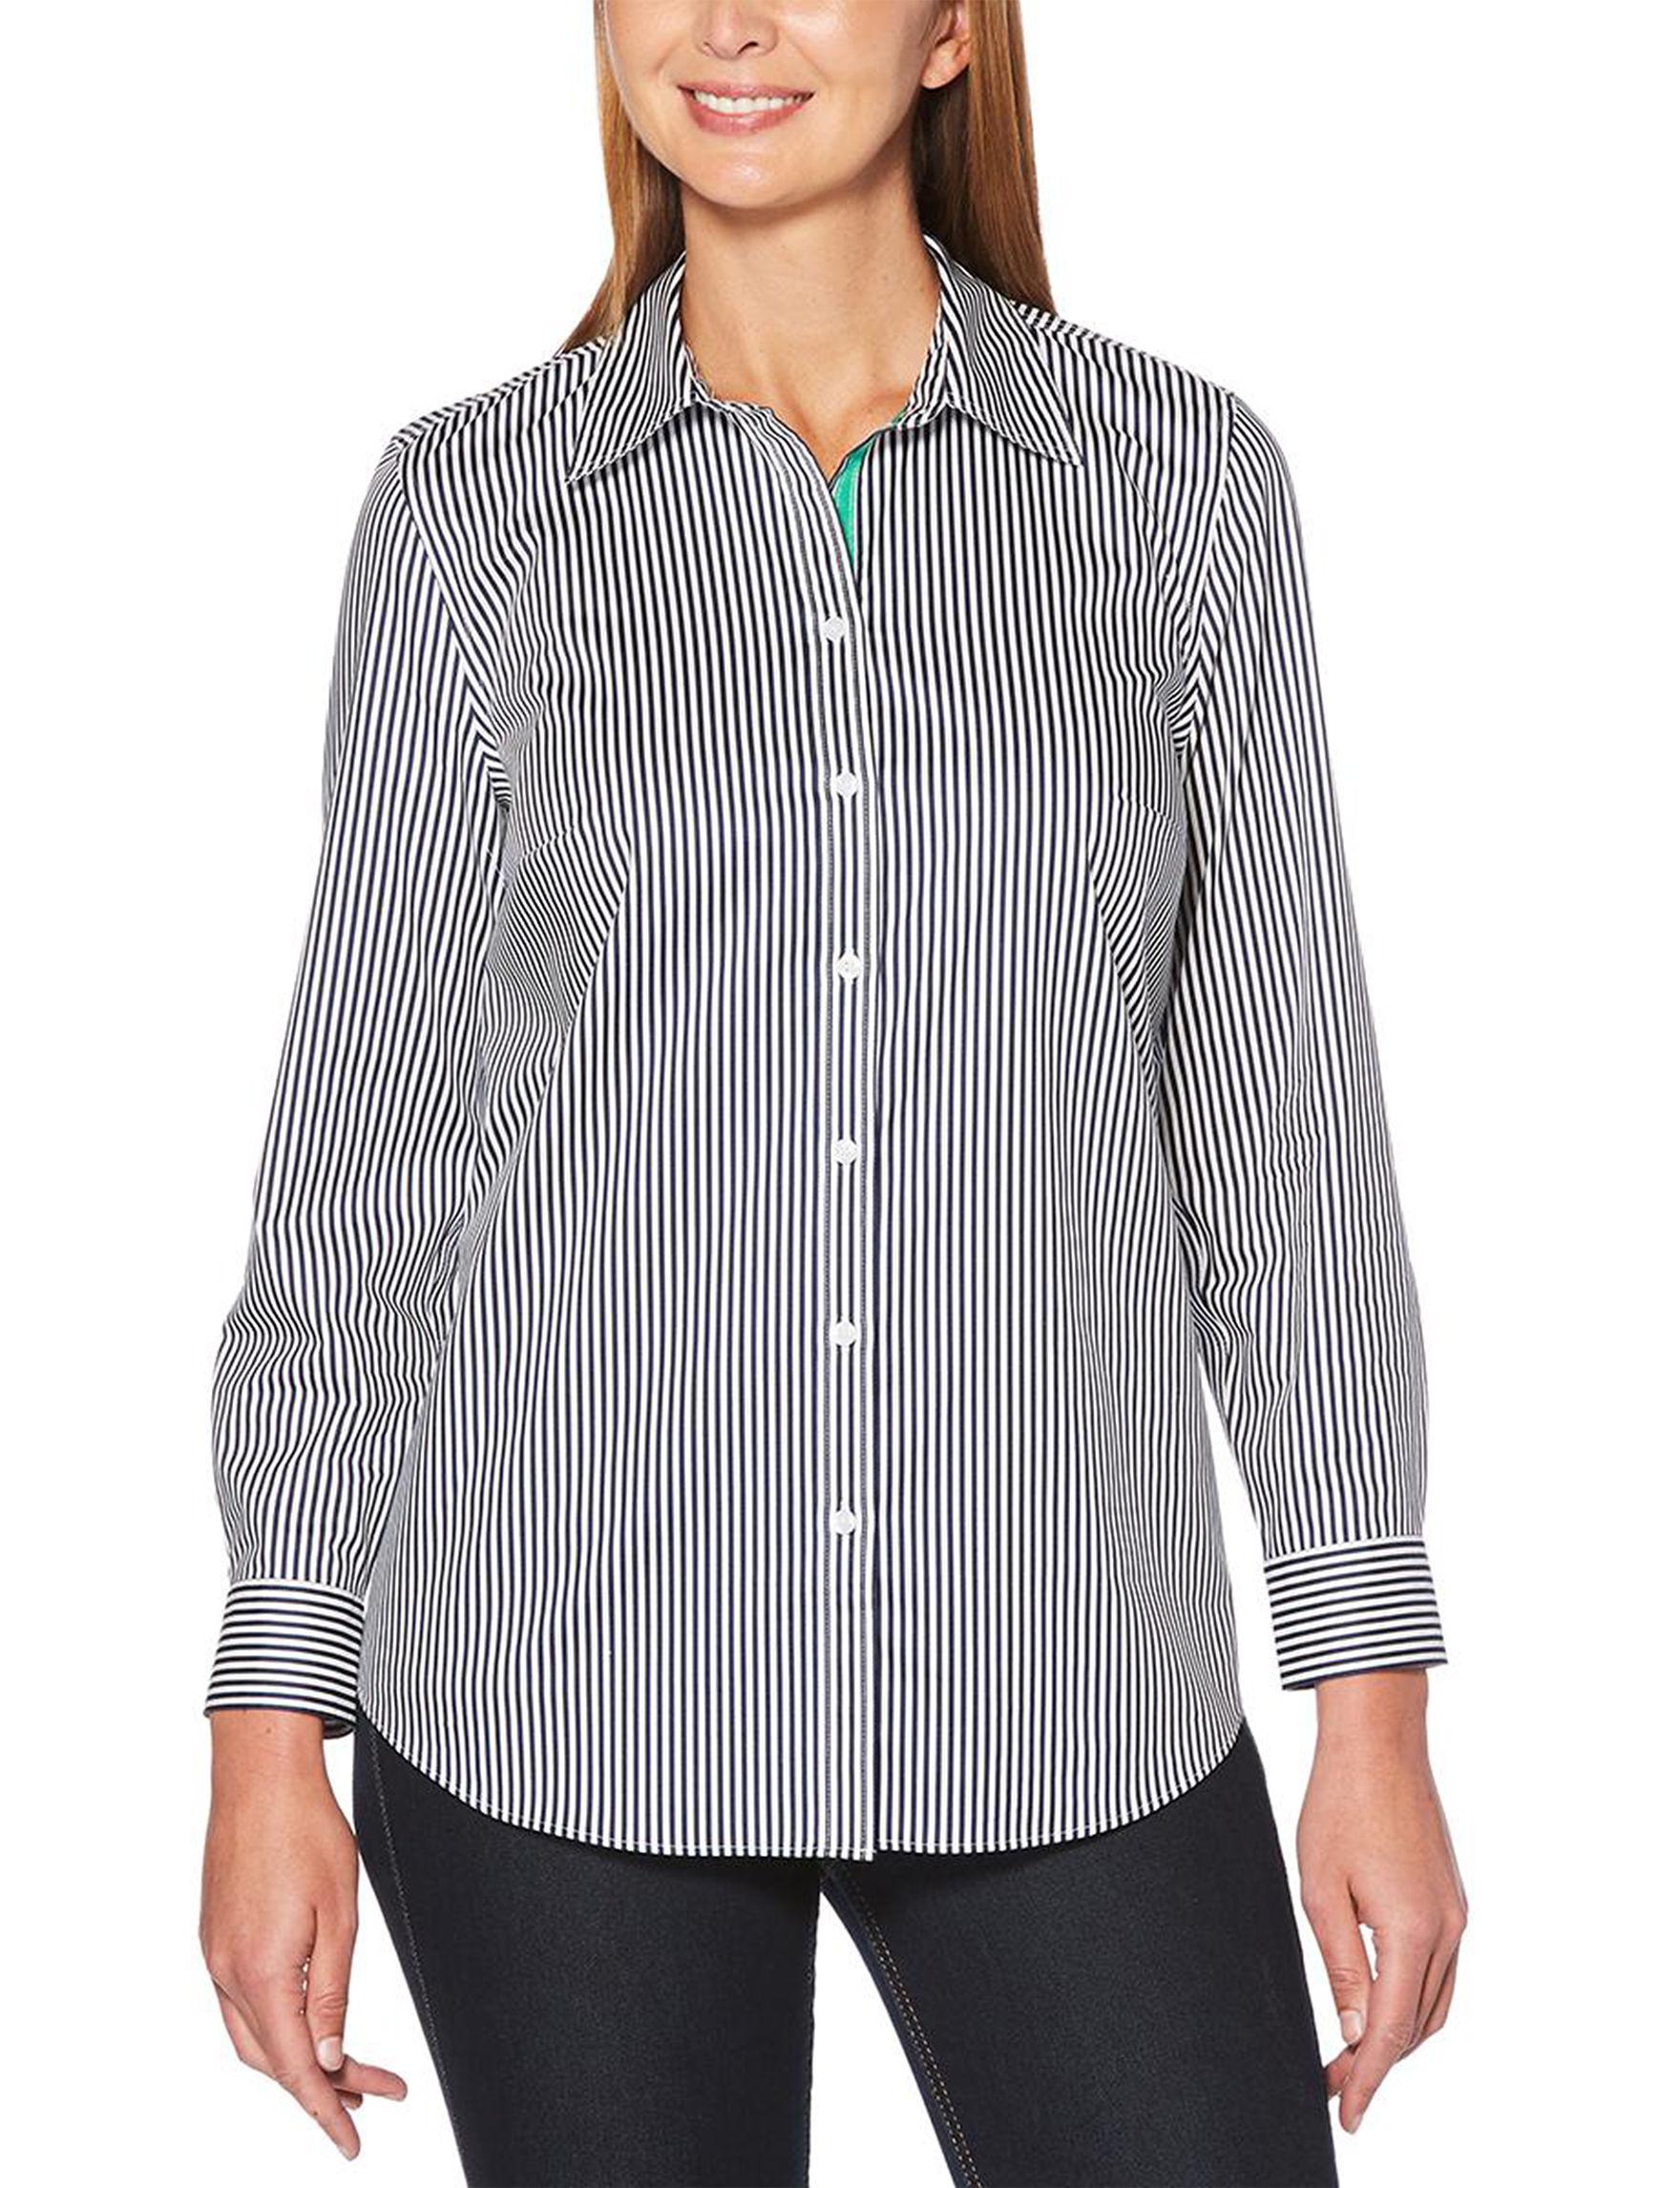 Rafaella Navy / White Shirts & Blouses